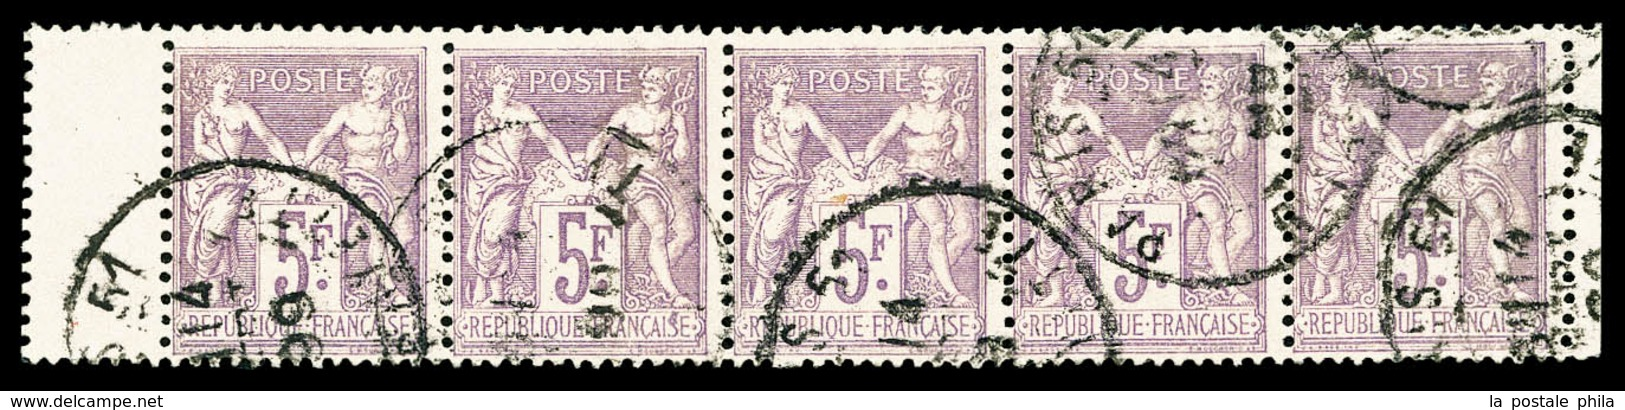 O N°95, 5F Violet Sur Lilas, Bande De 5 Bdf. SUP (certificat)  Qualité: O  Cote: 700 Euros - 1876-1878 Sage (Type I)